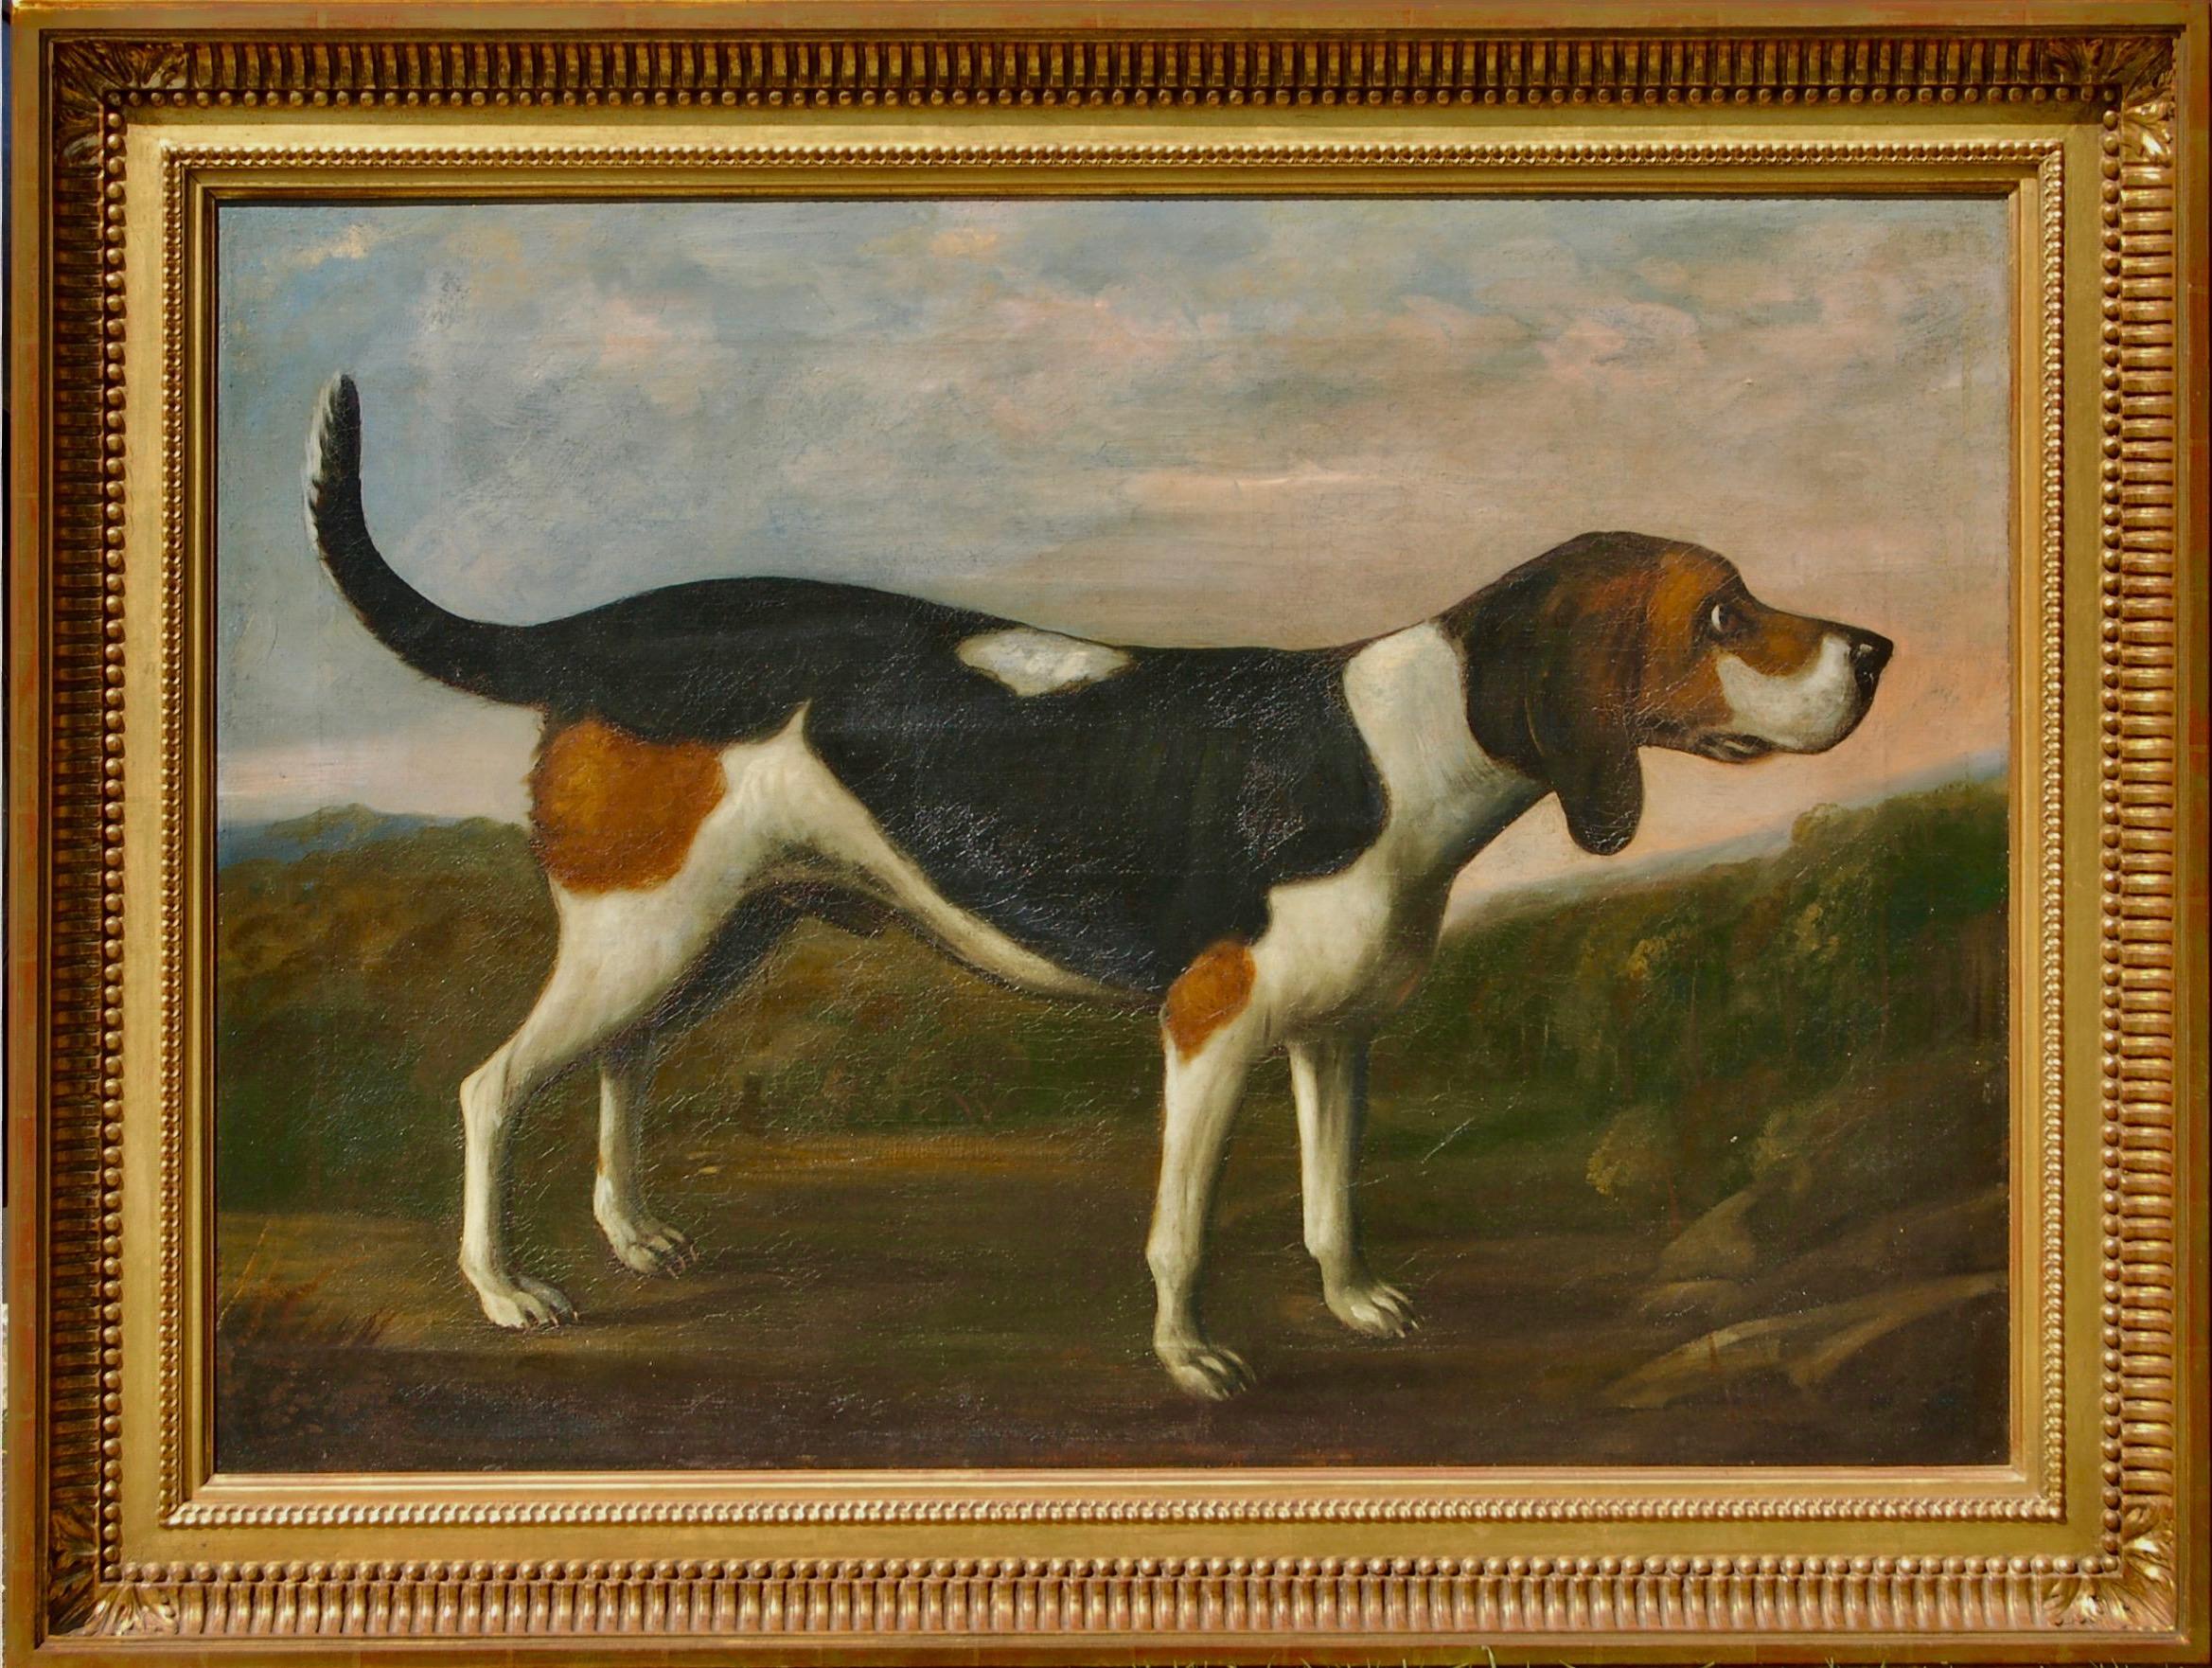 English 19thC folk art oil portrait of a Beagle hound in a landscape circa 1830